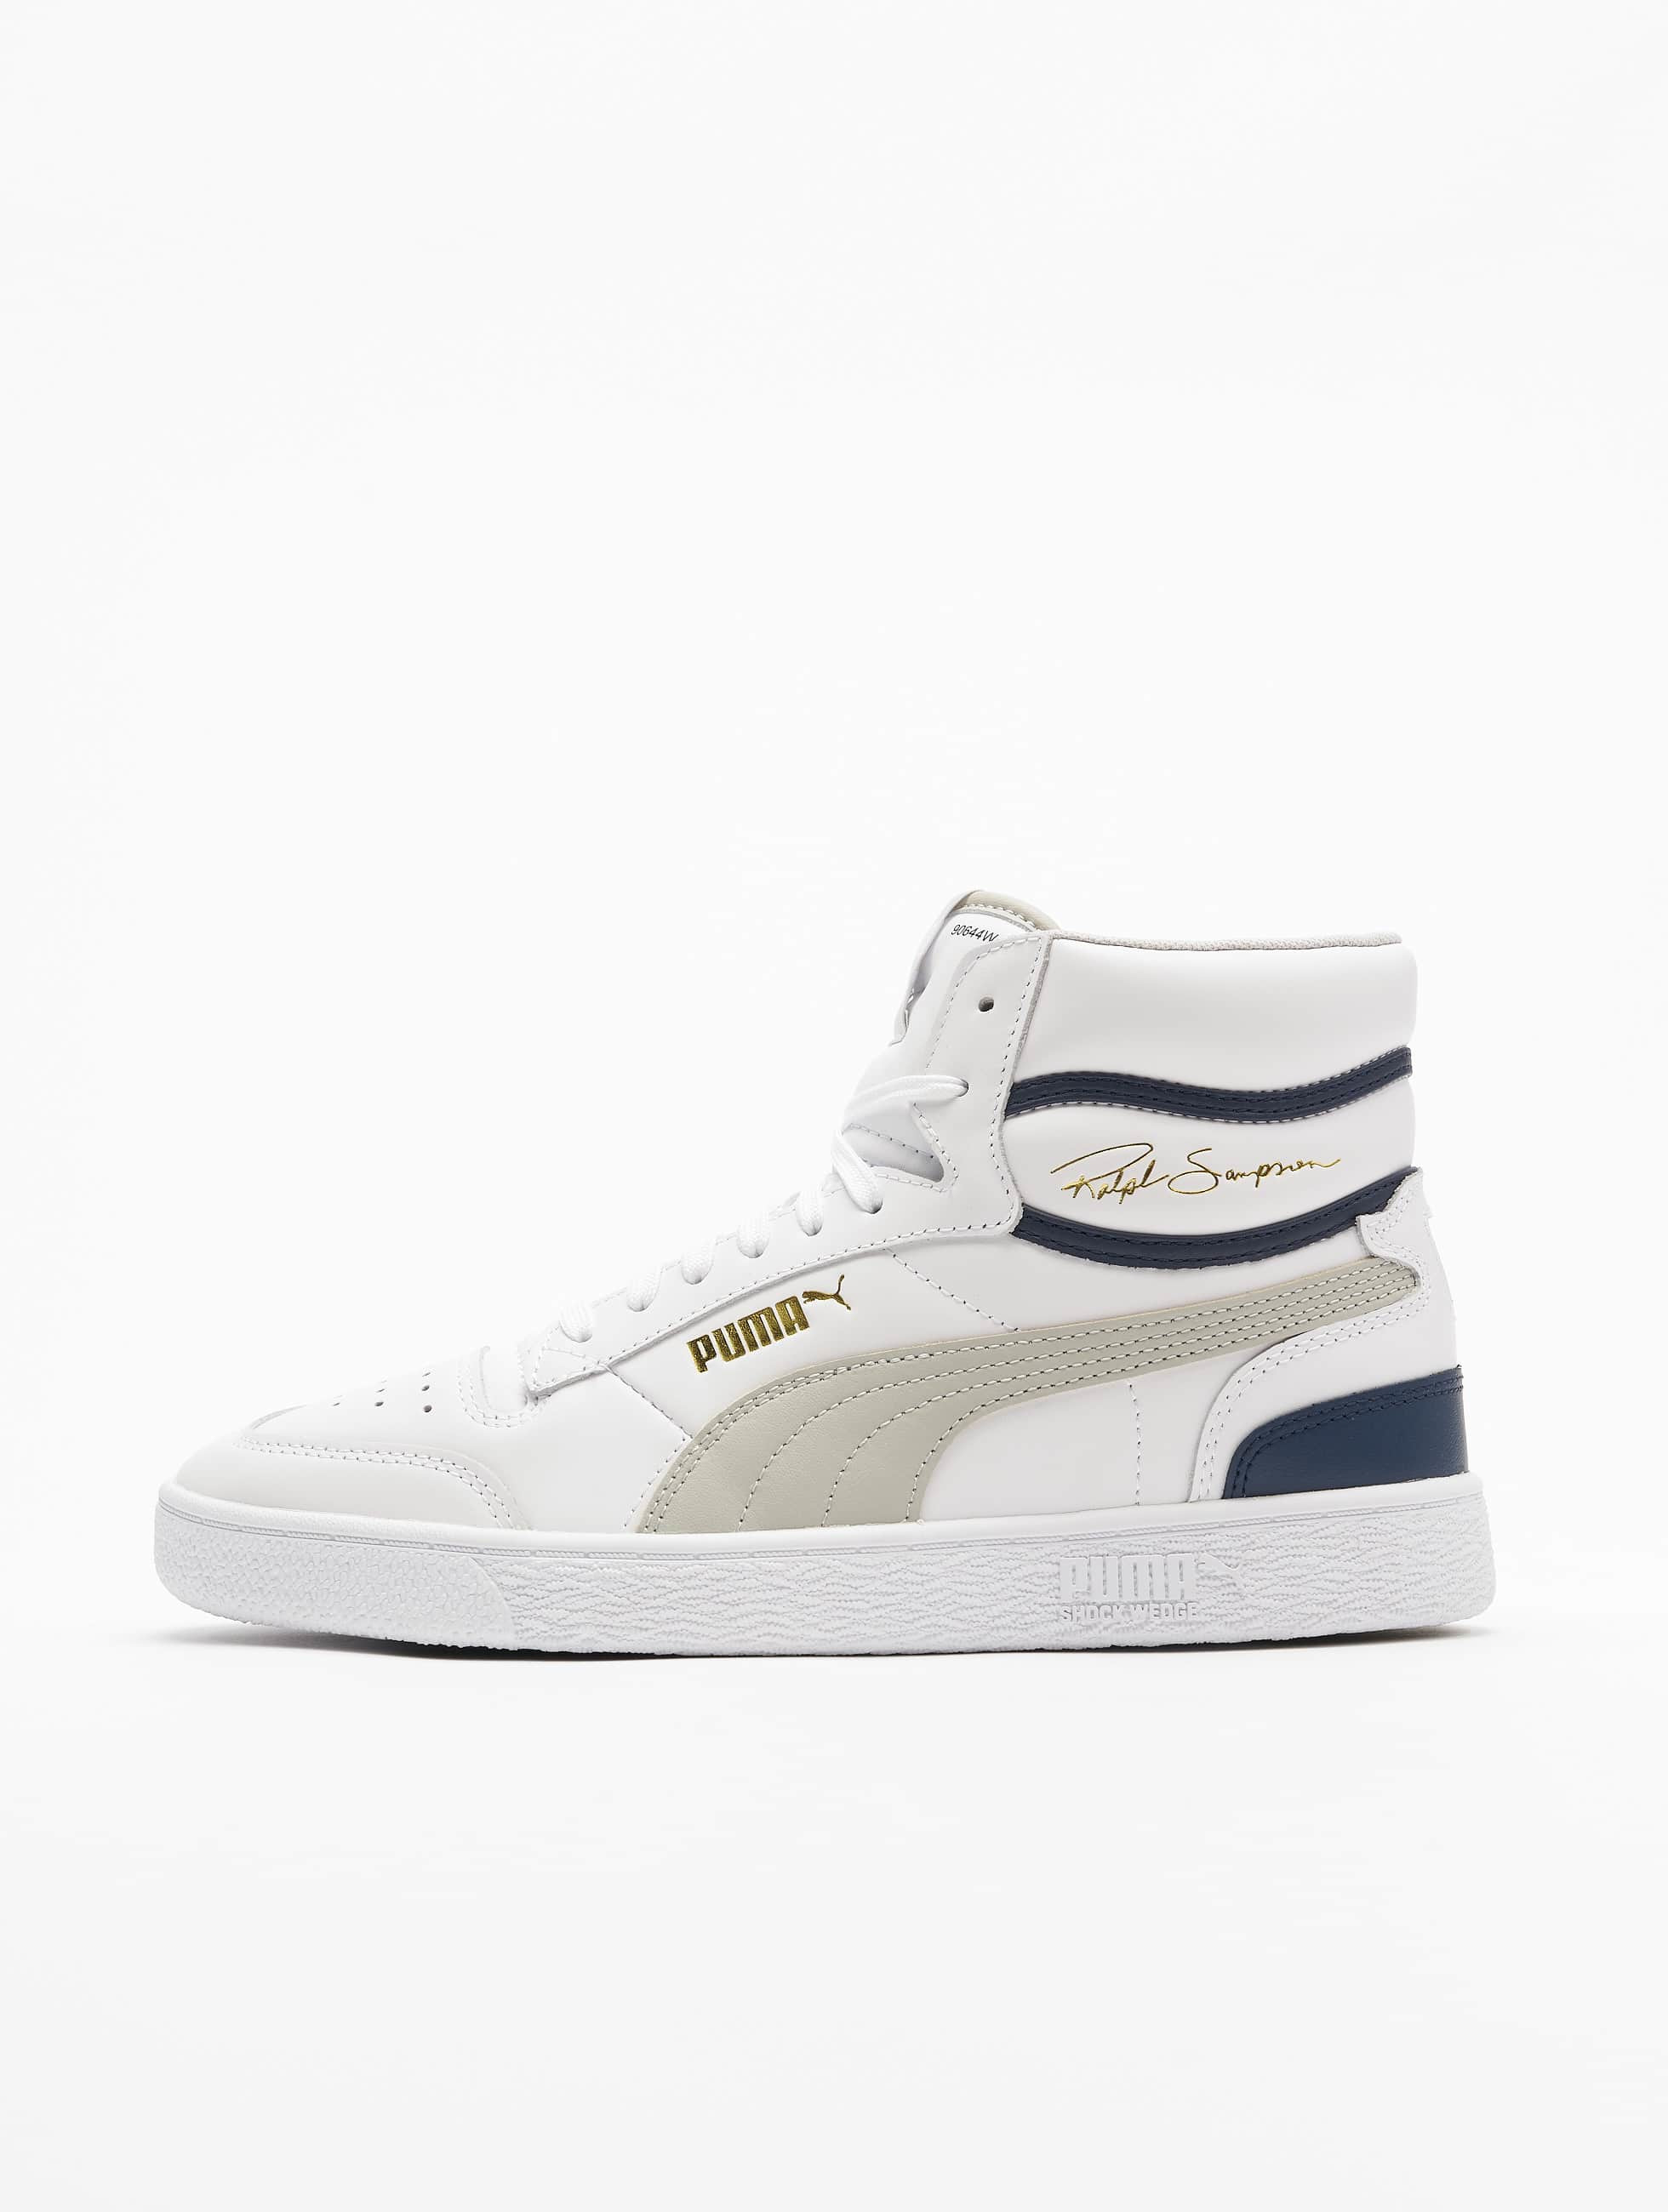 Puma Ralph Sampson Mid Sneakers Puma WhiteGray VioletPeacoat